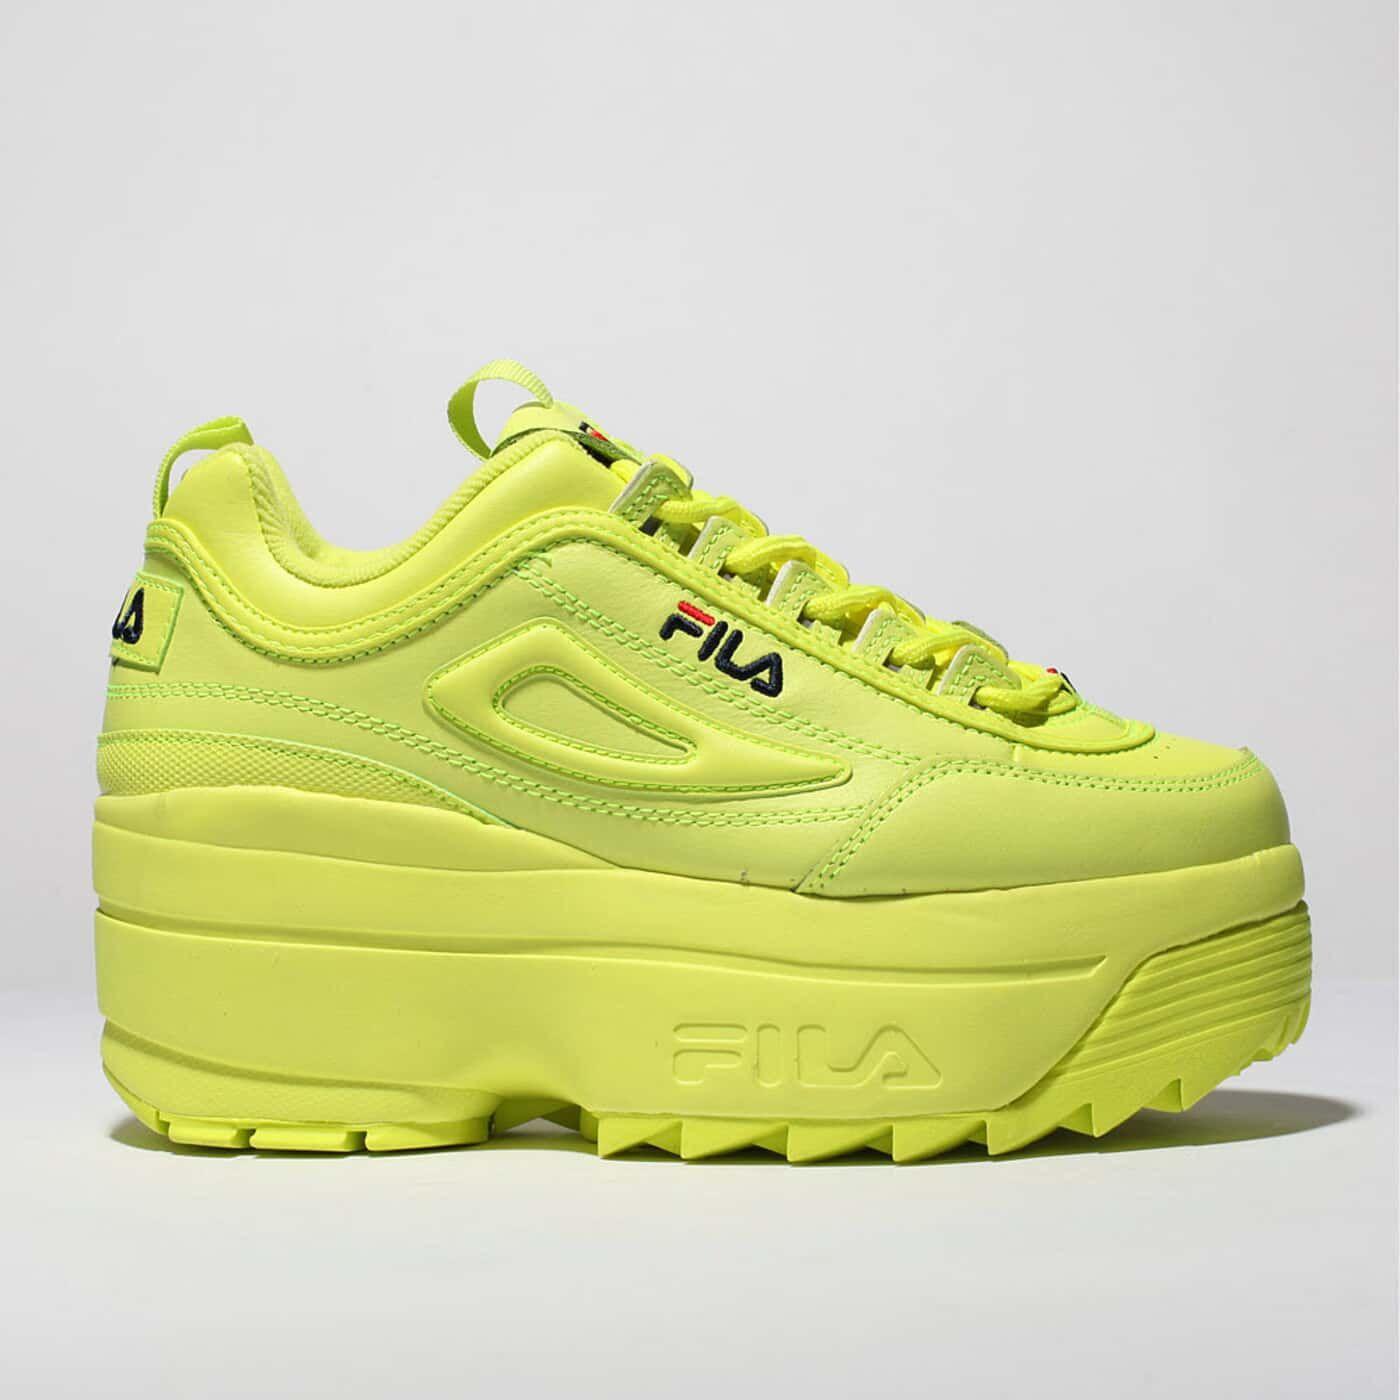 Shoes | Shop Men's, Women's & Kids' Footwear | schuh